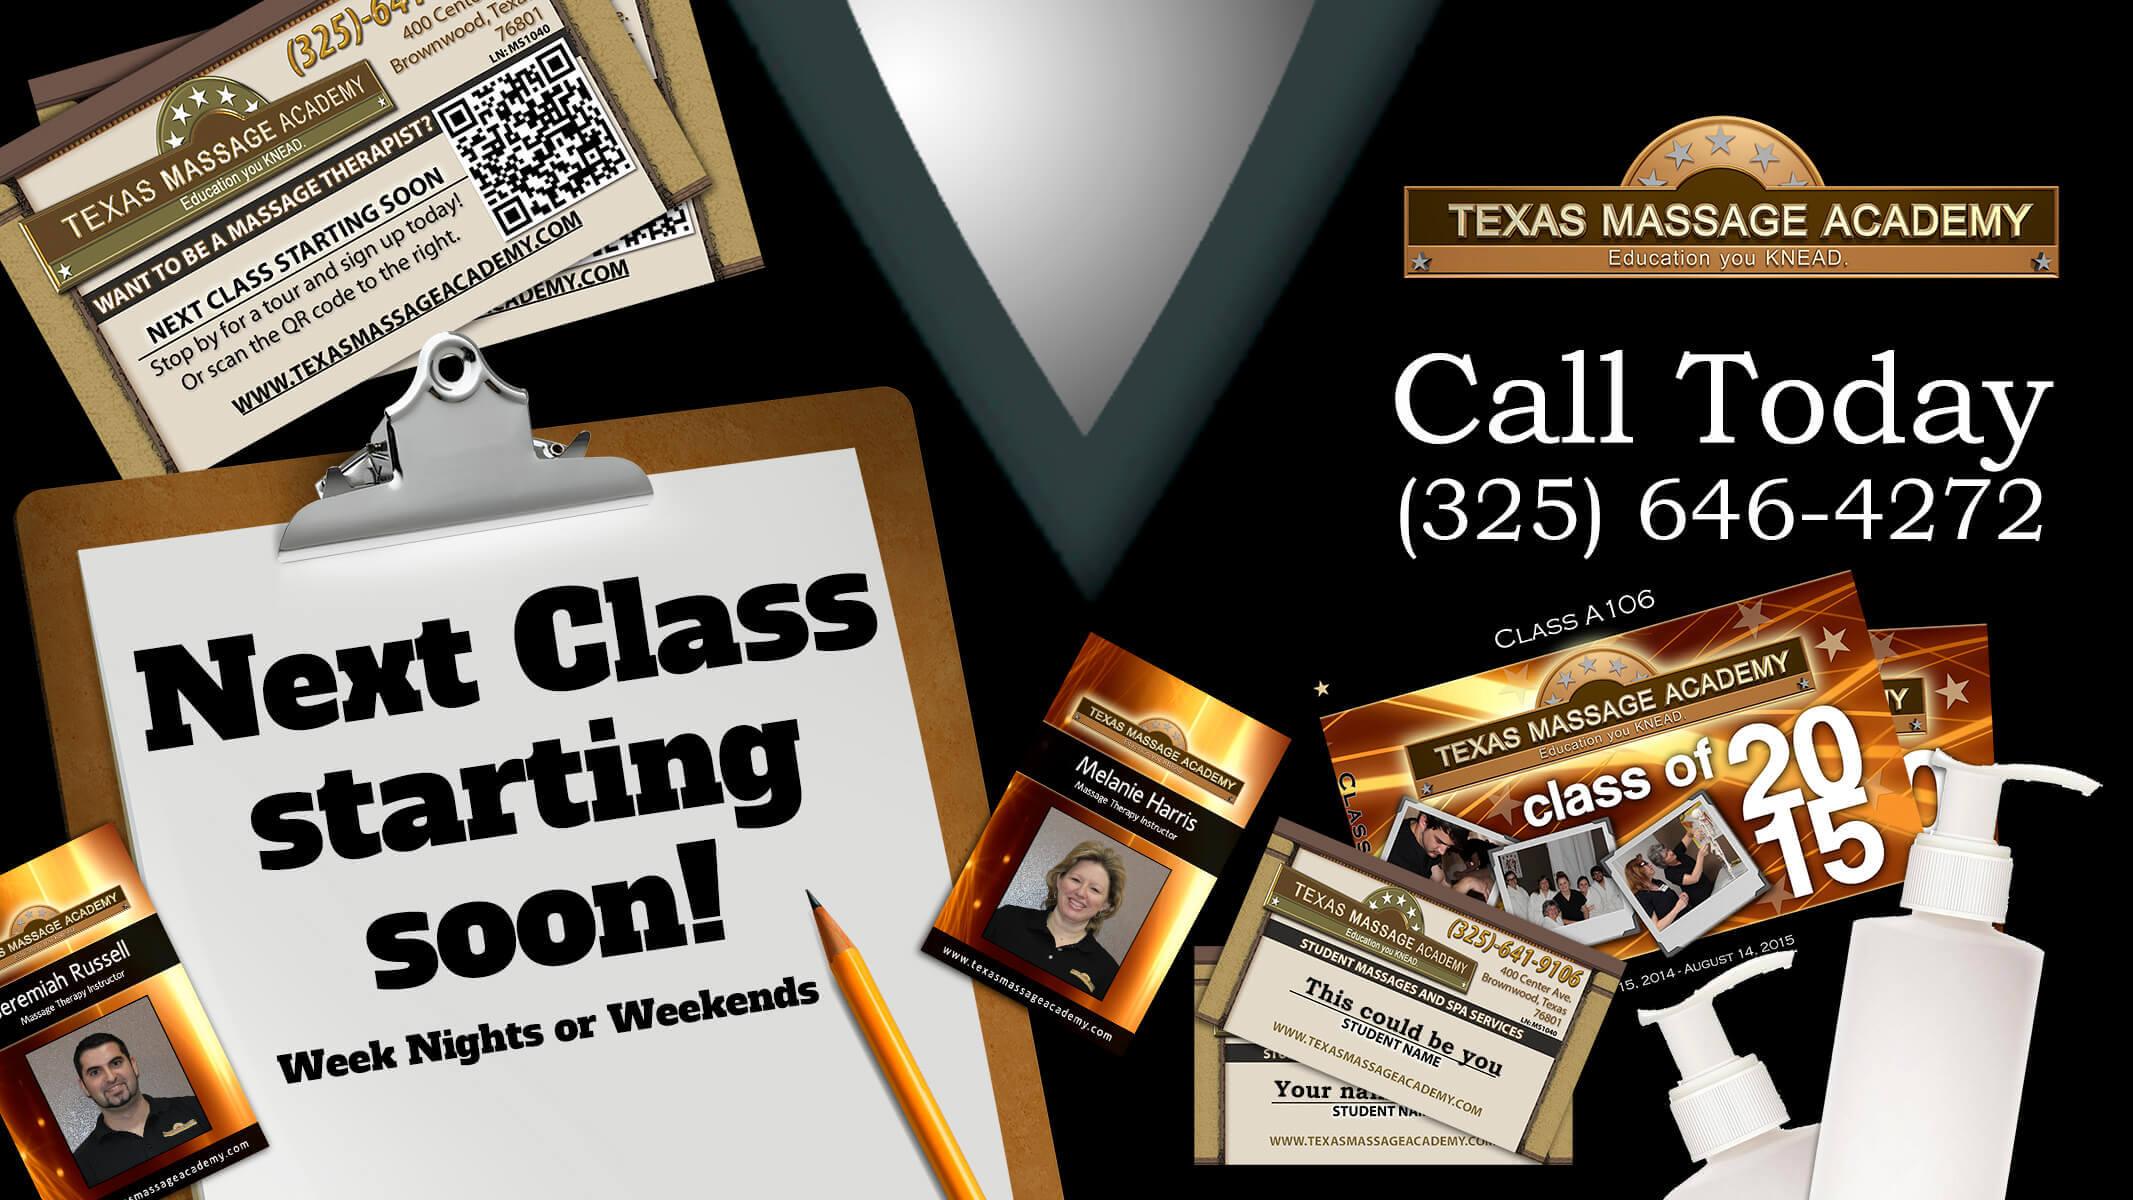 Texas Massage Academy Your Central Texas Massage School